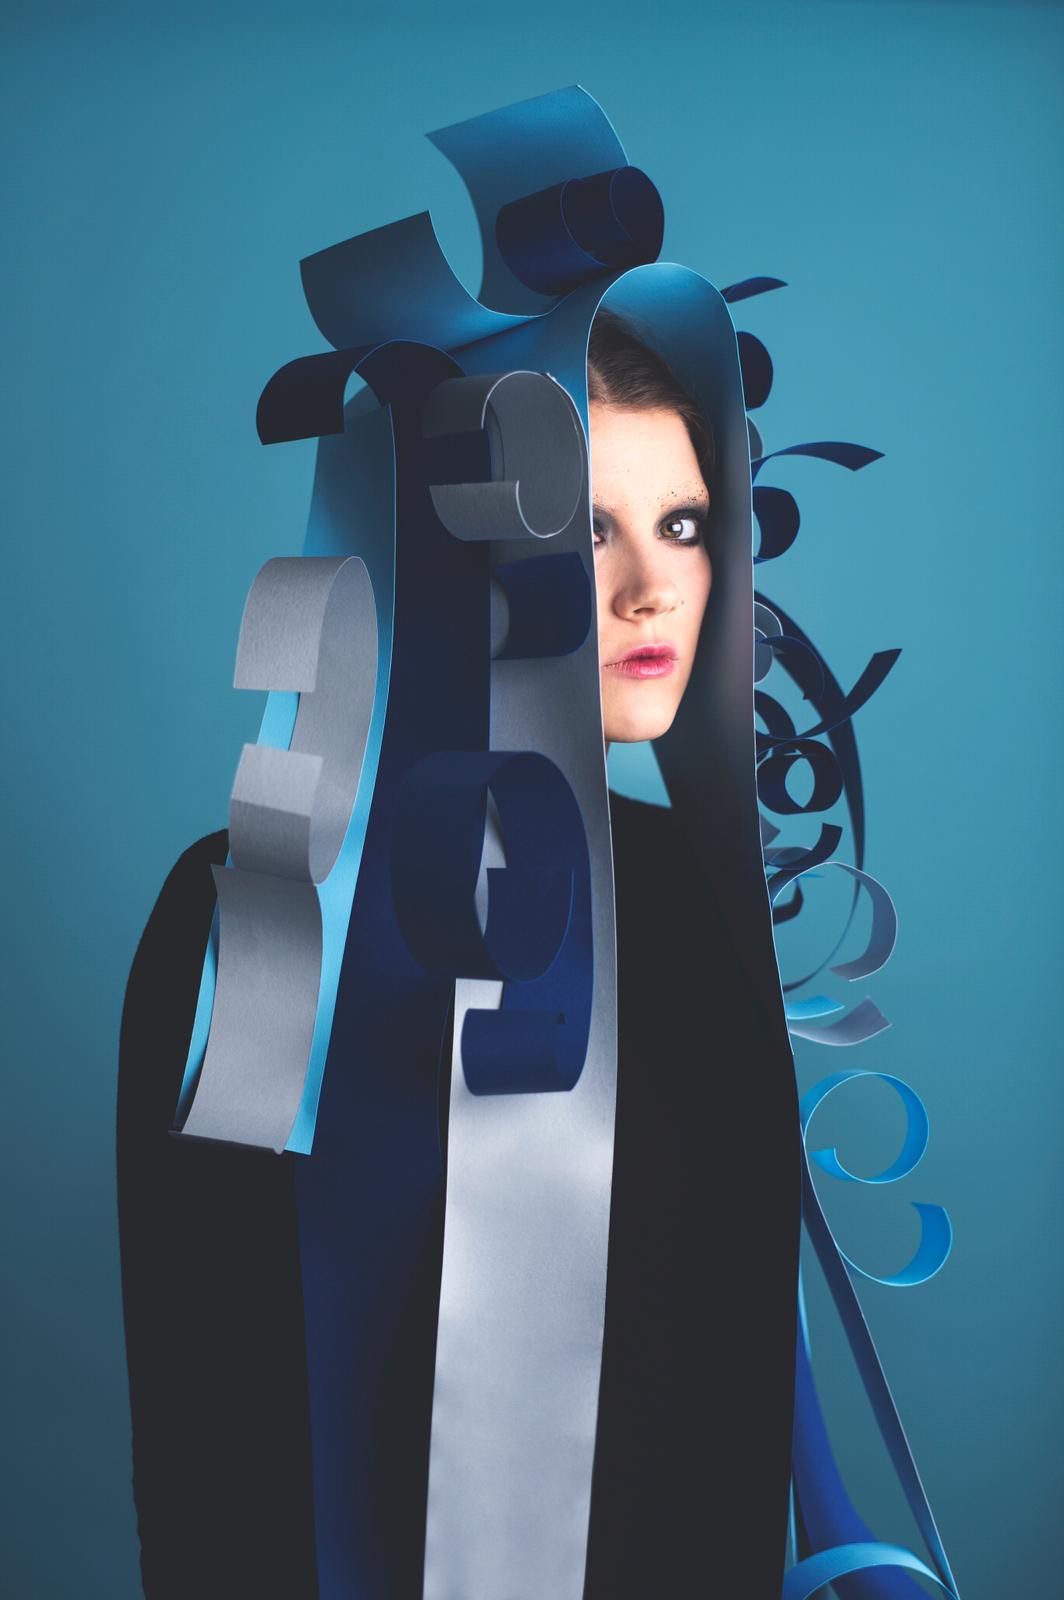 Paper Headdress, fashion model, blue background, Monochrome